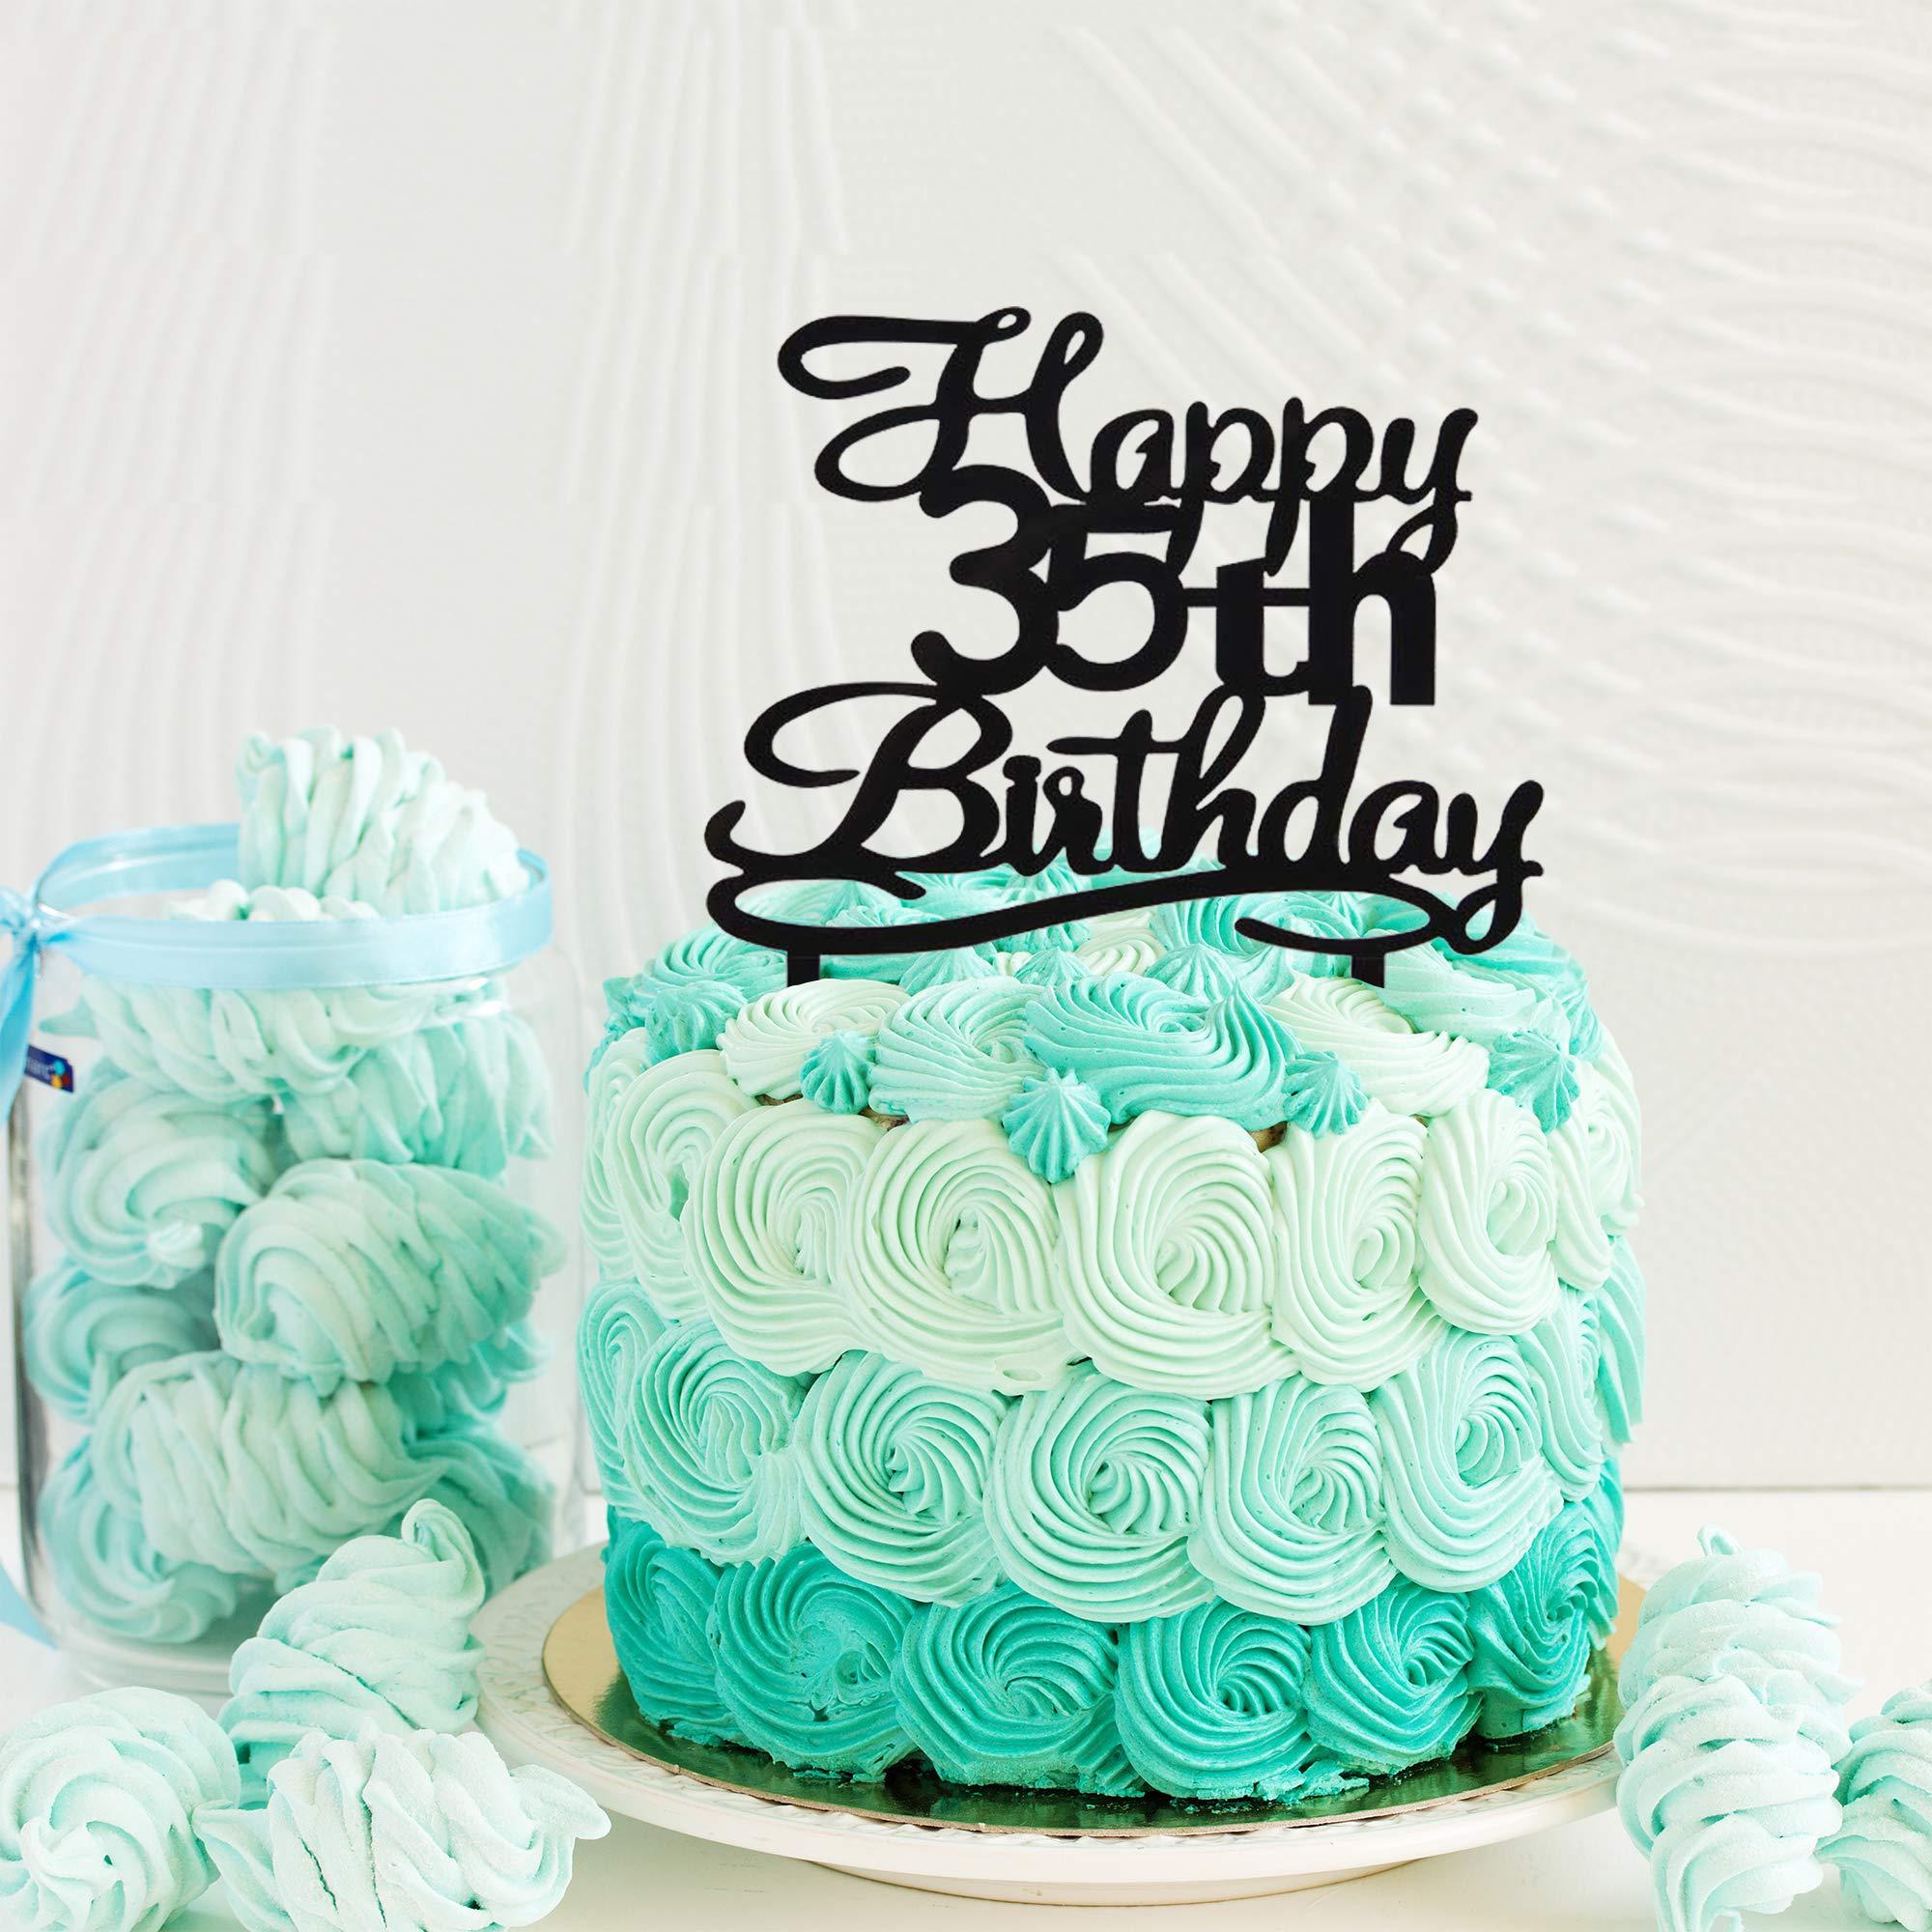 Incredible Happy 35Th Birthday Cake Topper Black Acrylic Cake Topper Number Funny Birthday Cards Online Hetedamsfinfo